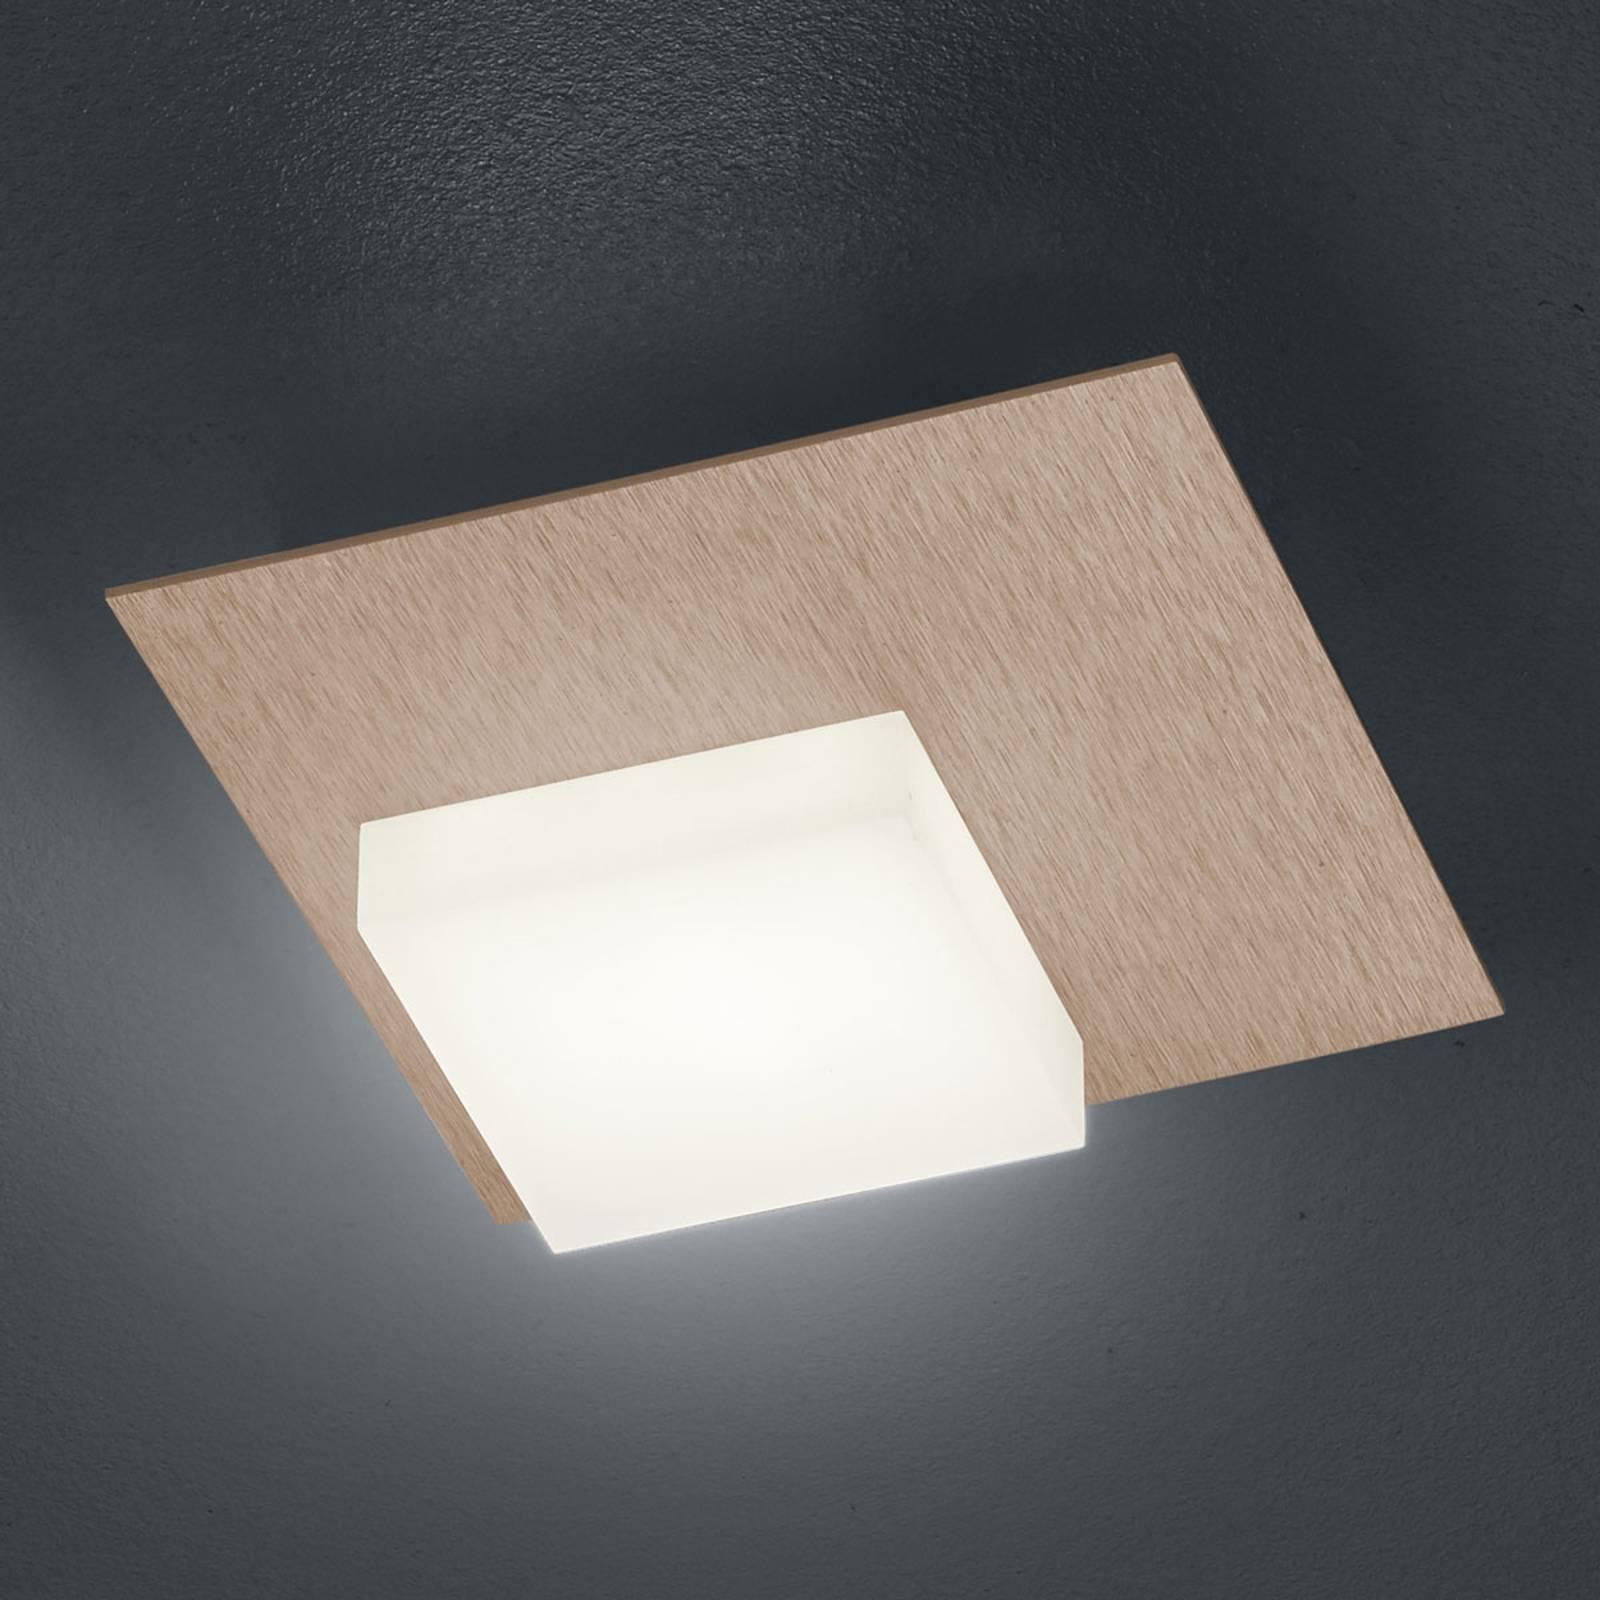 BANKAMP Cube LED plafondlamp 8W, rosegoud